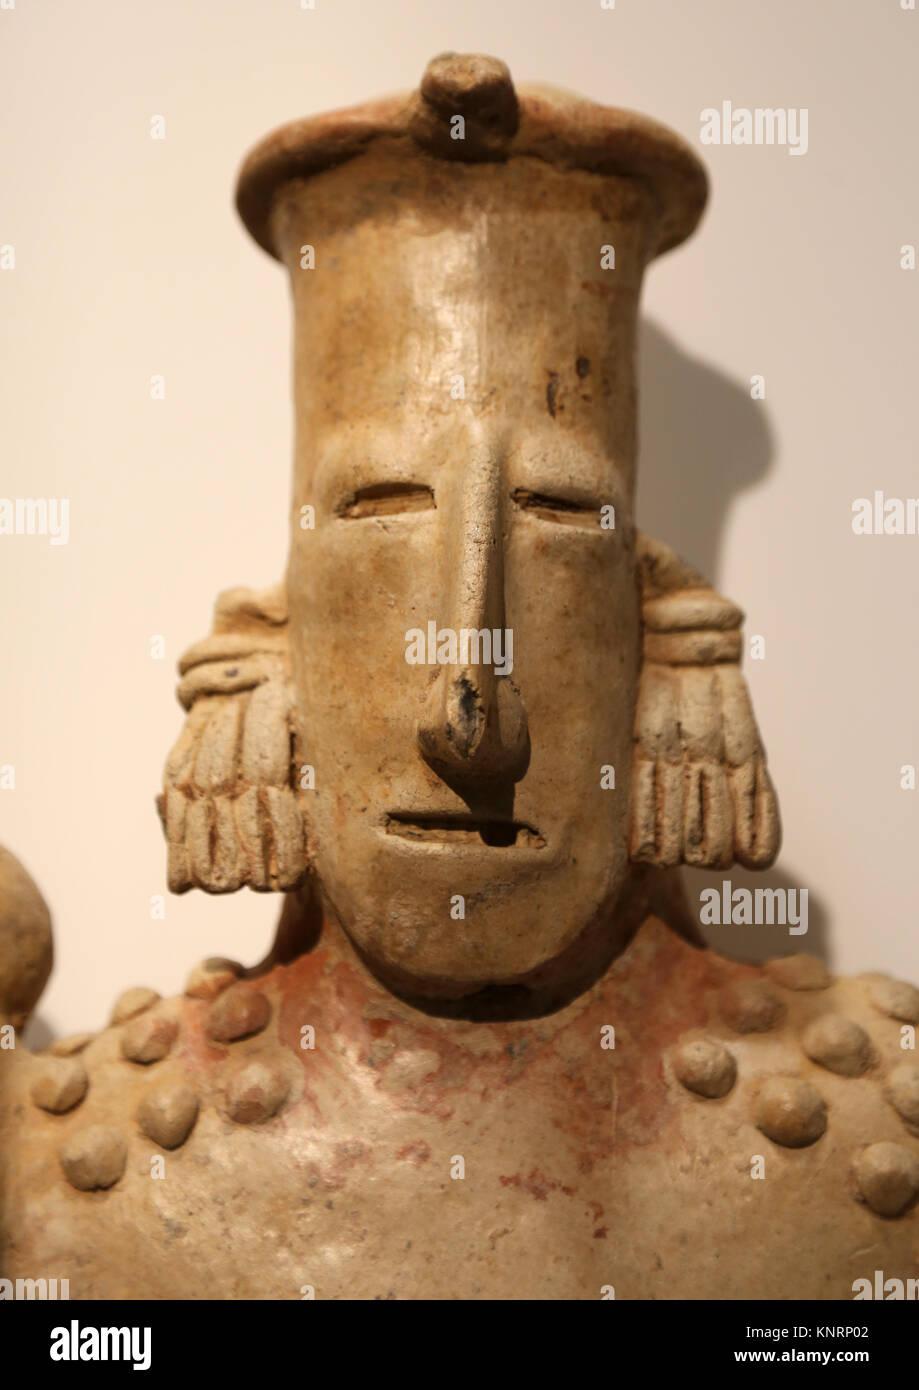 Mesoamerika. Precolombian. Elite Abbildung. Jalisco-Mexico. 200 v. Chr.-400 N. Poterry. Museum der Cutures der Welt. Stockbild